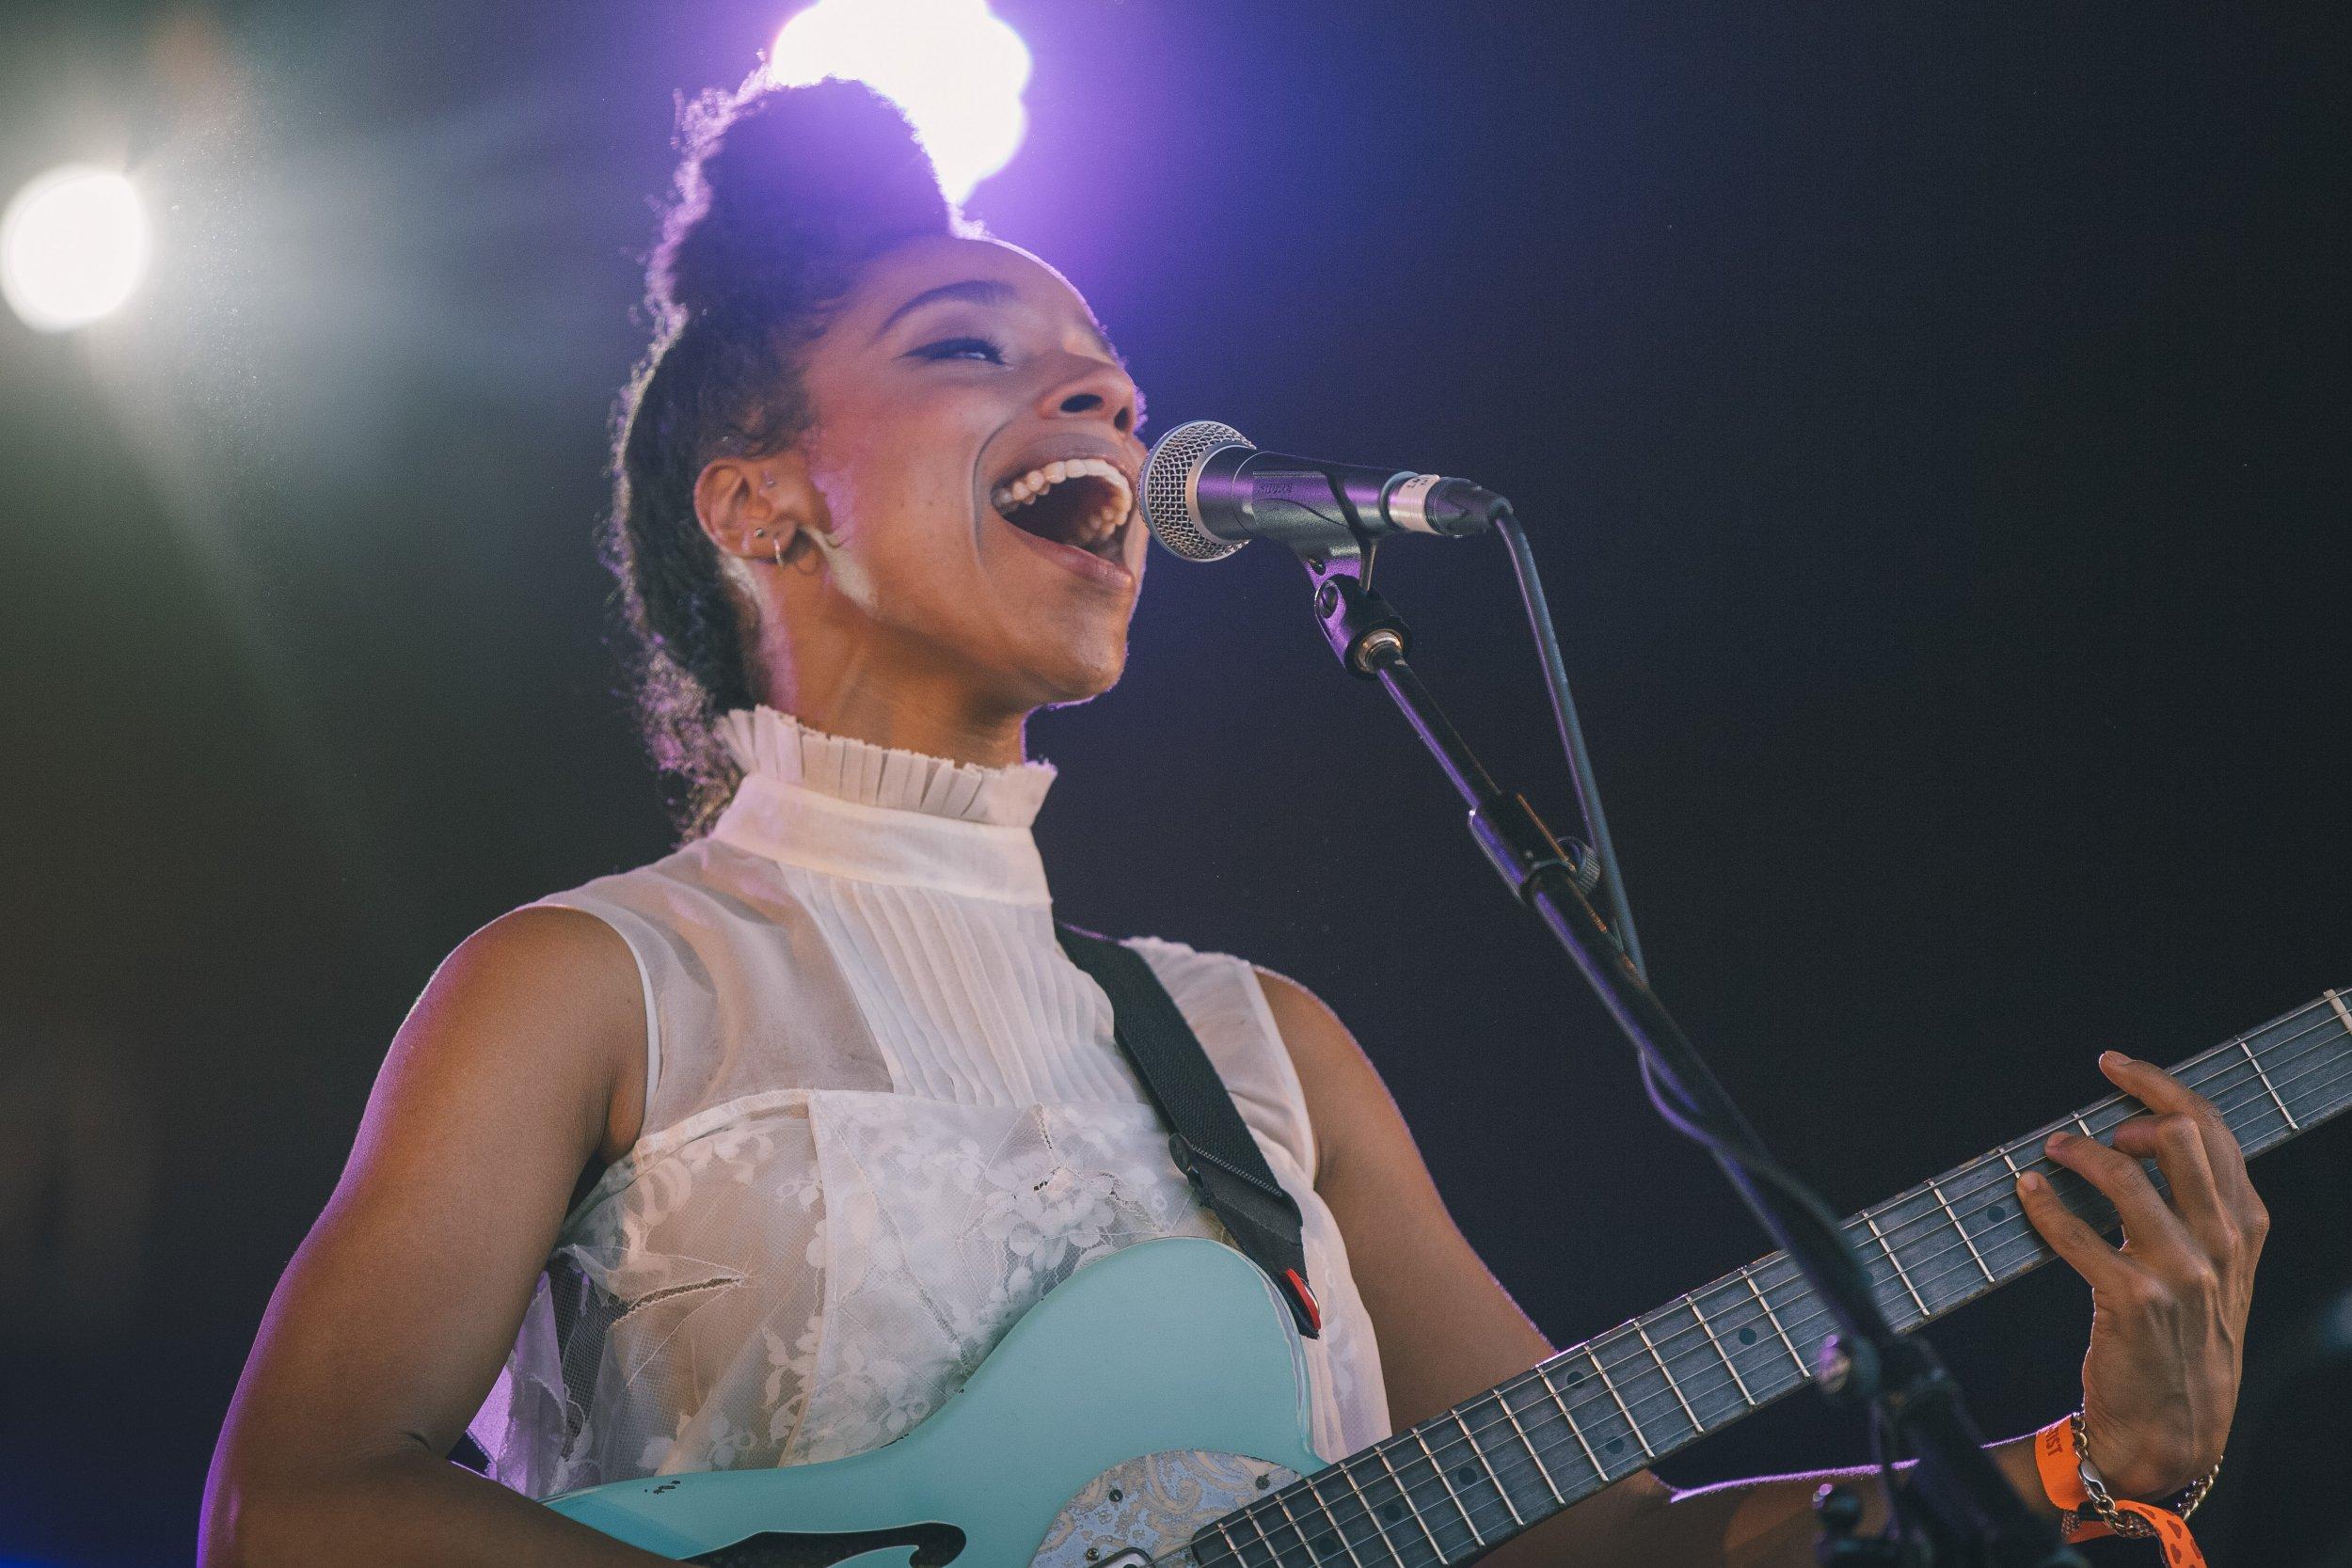 Lianne La Havas at Citadel festival 2016